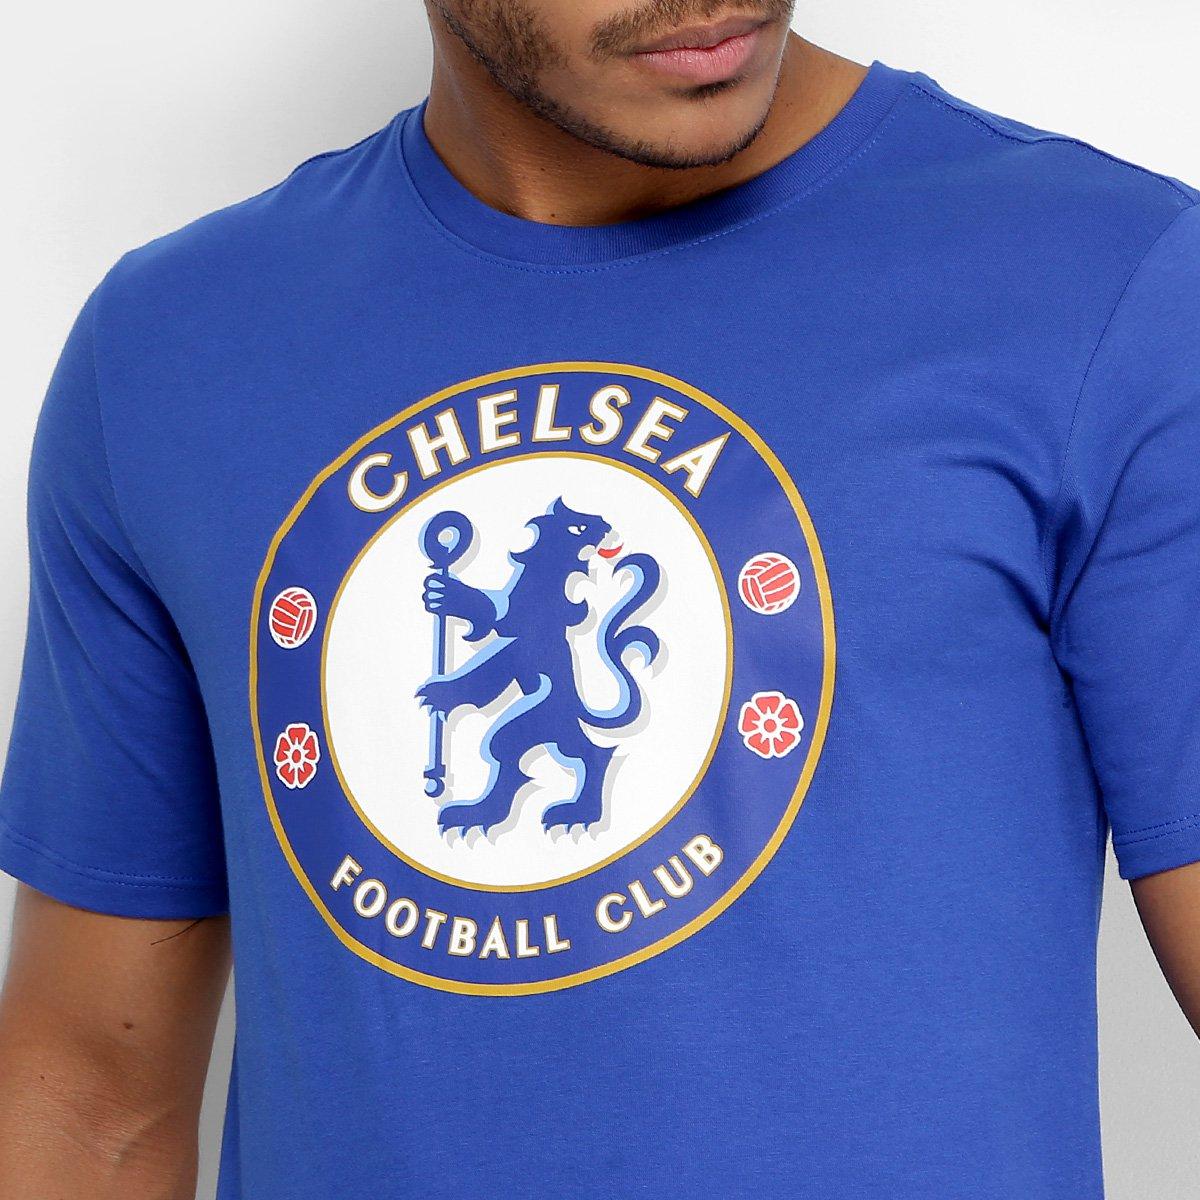 Camiseta Chelsea Evergreen Crest Nike Masculina - Compre Agora ... b941faf4952aa